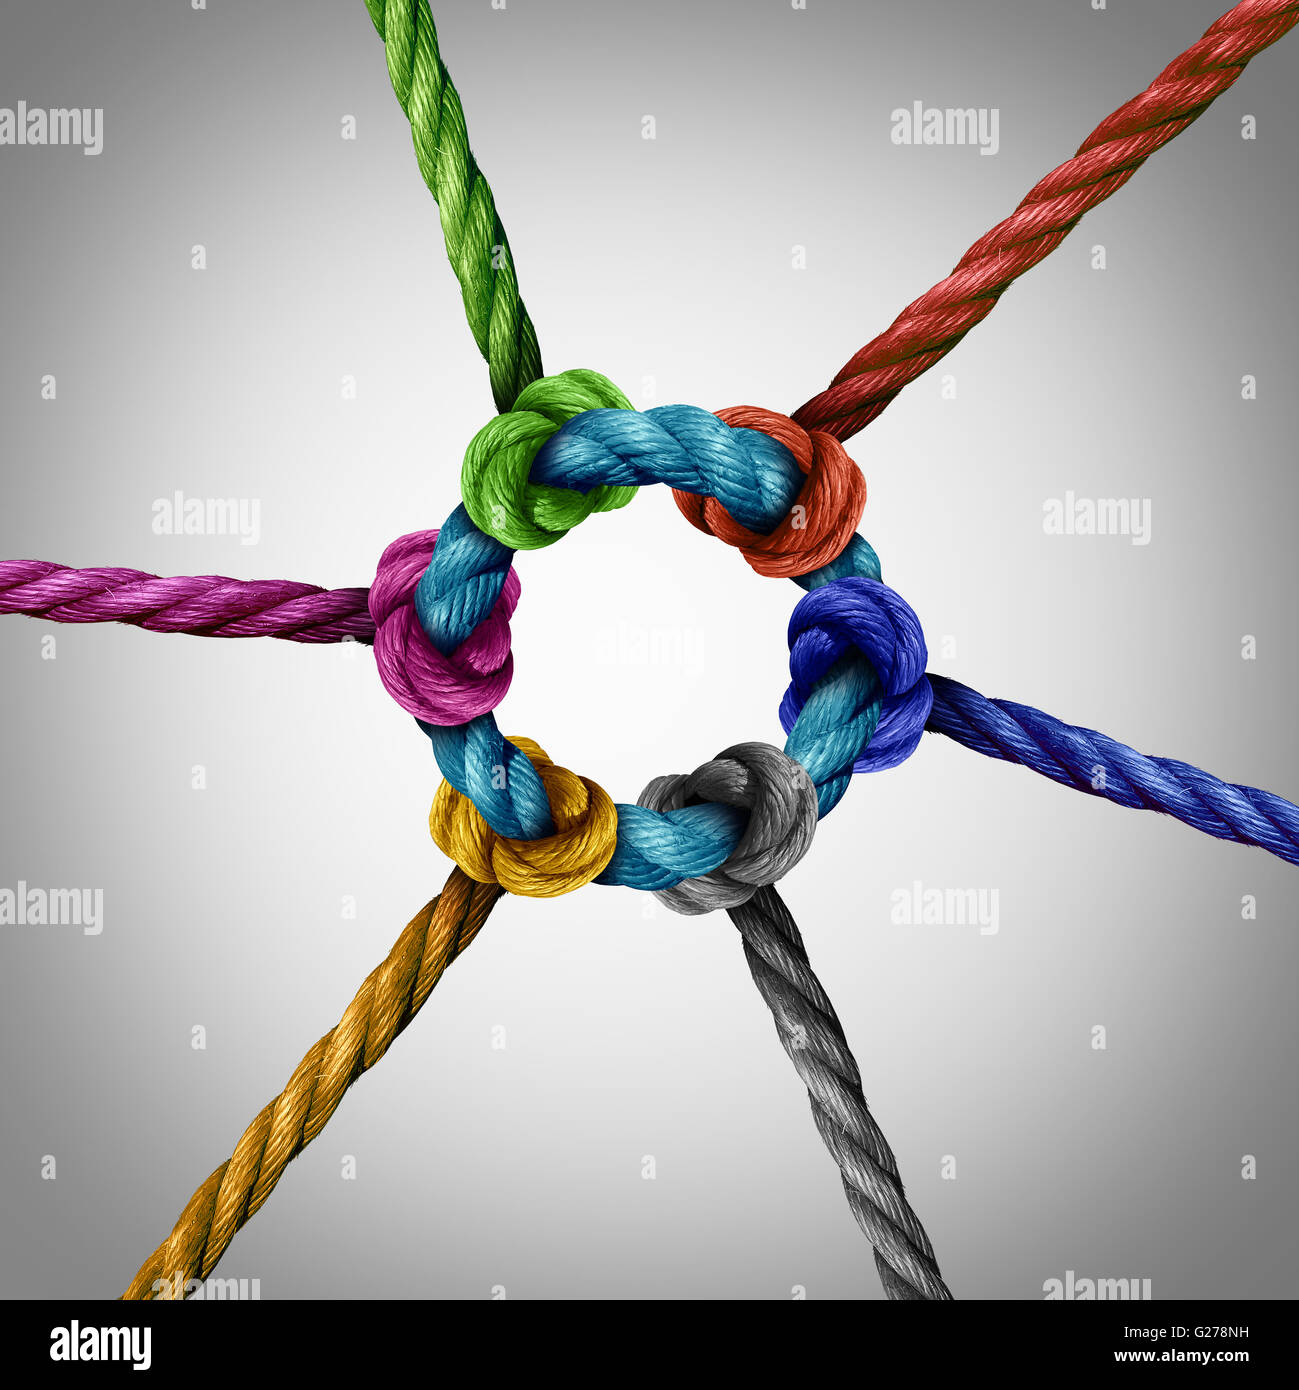 Conexión de red central el concepto empresarial como un grupo diverso de cuerdas conectadas a un círculo Imagen De Stock